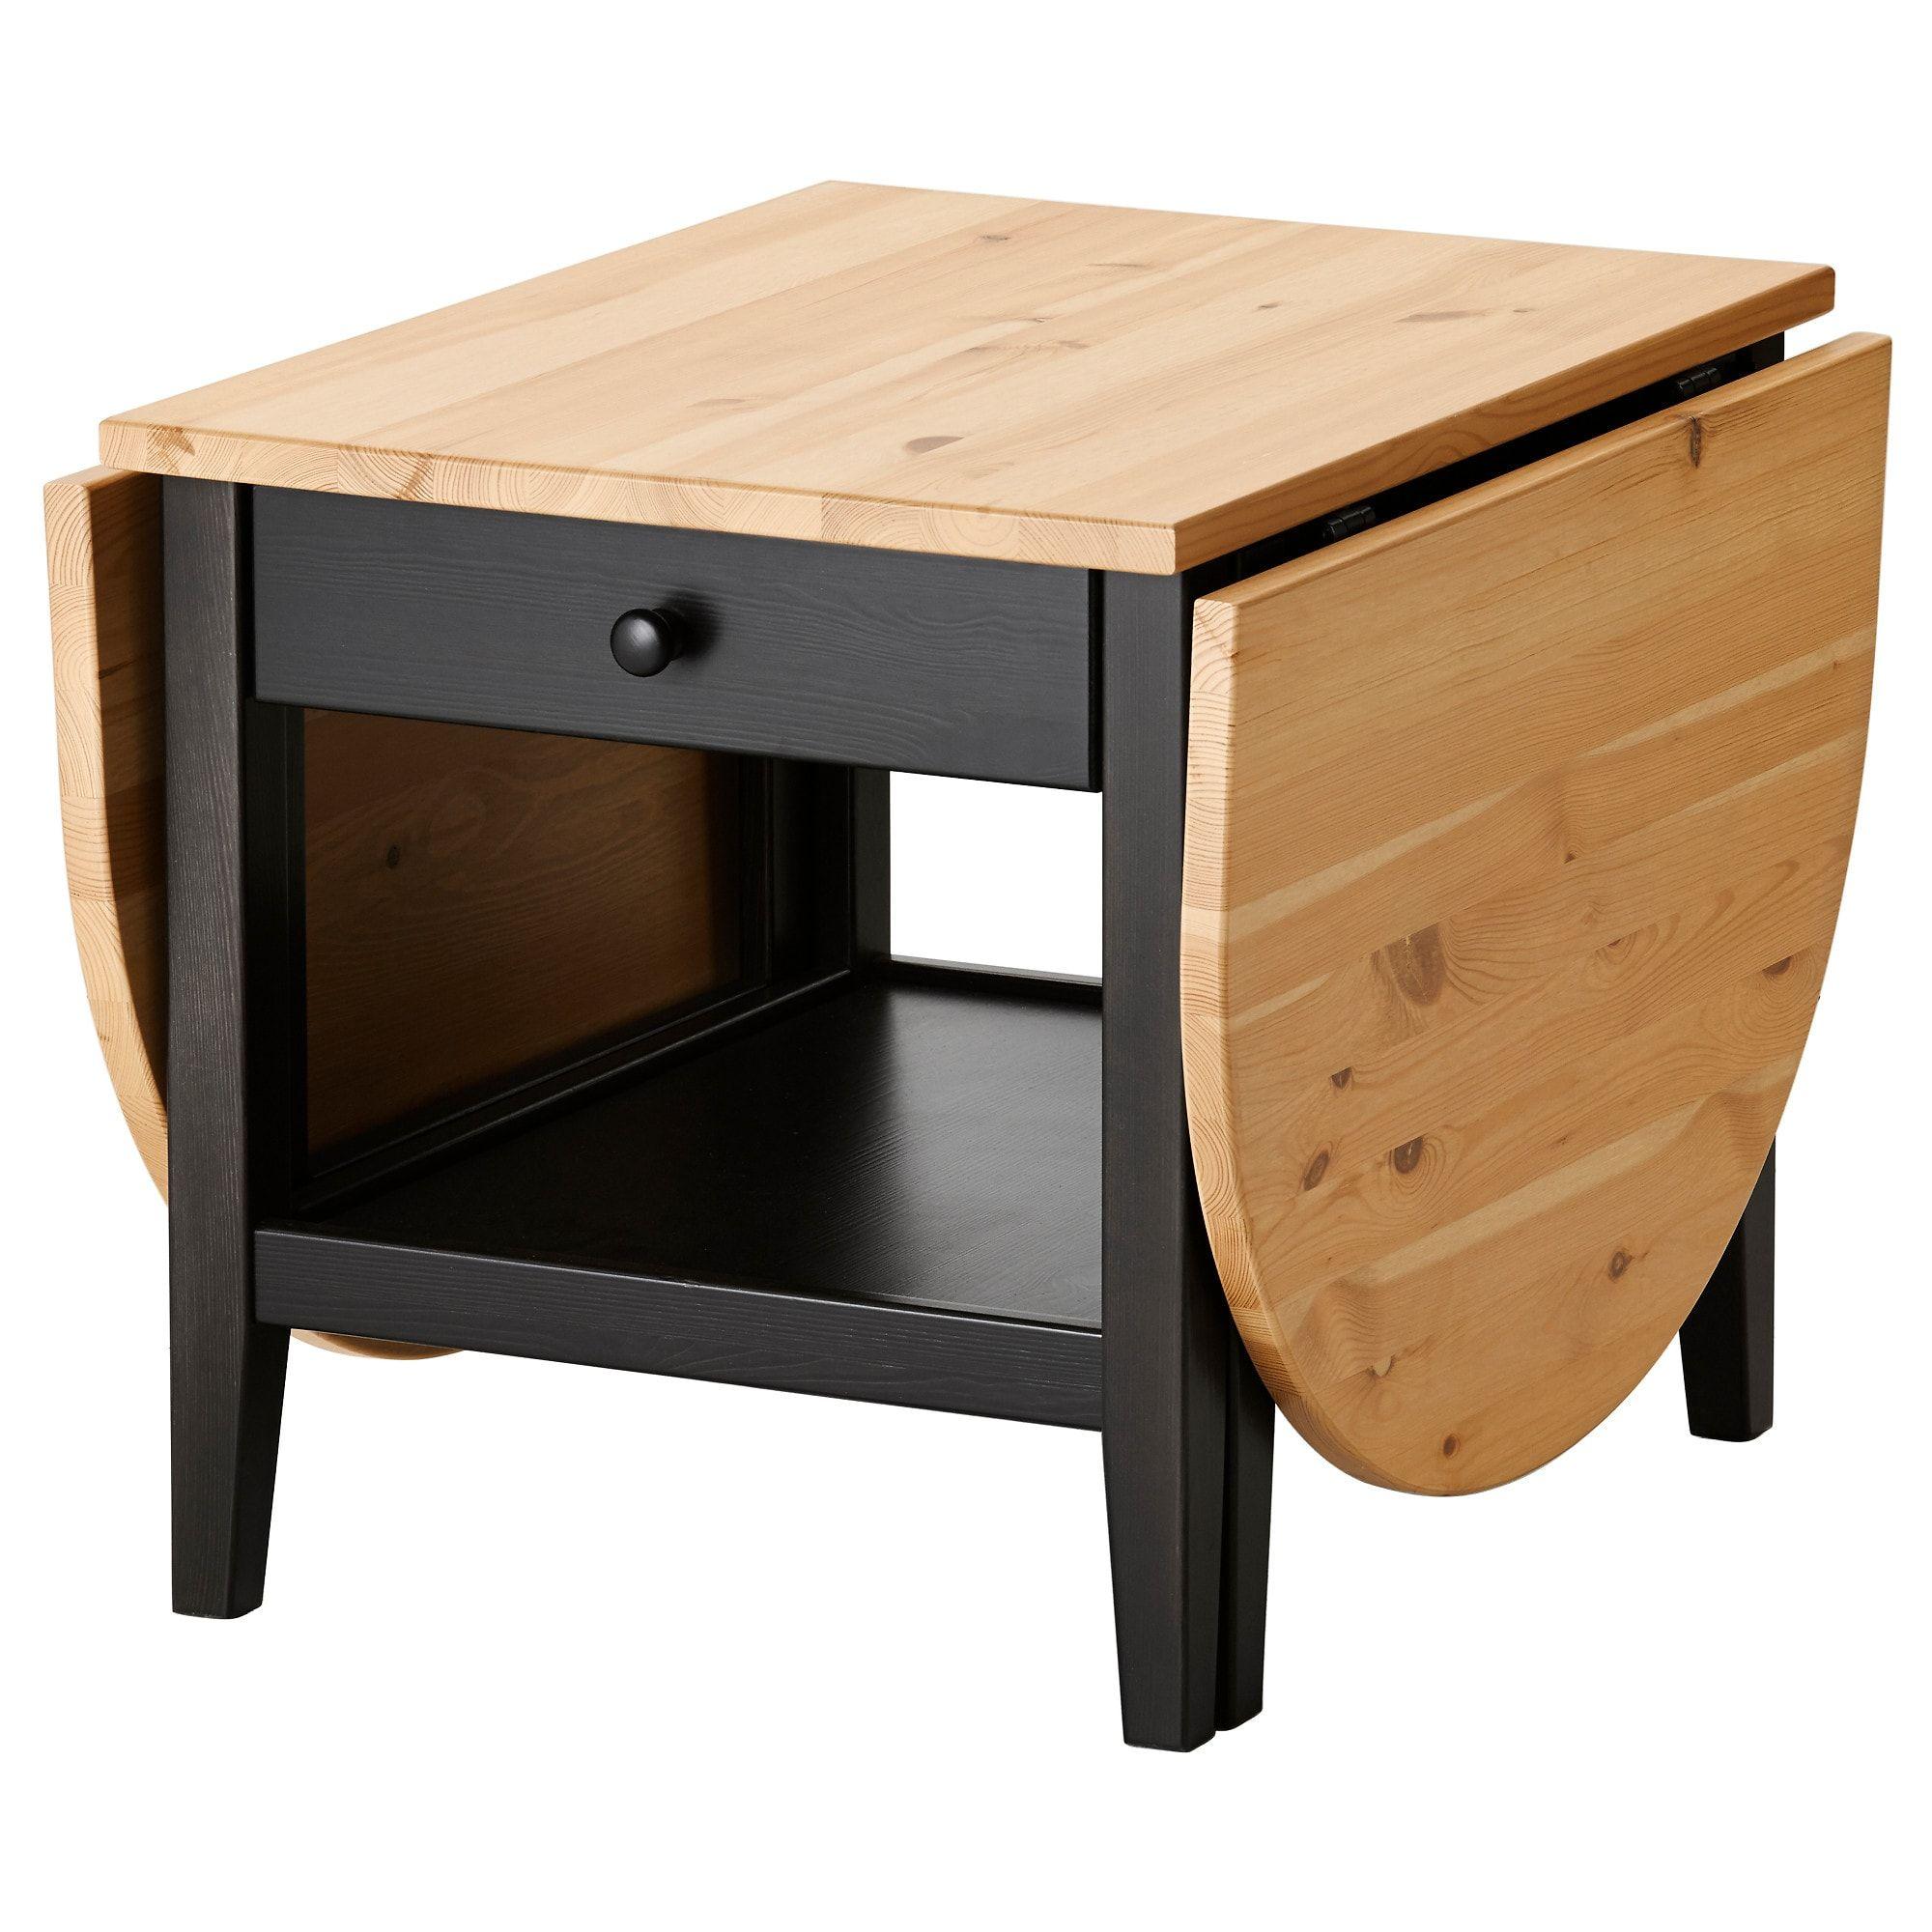 Arkelstorp Coffee Table Black Ikea In 2020 Coffee Table Coffee Table [ 2000 x 2000 Pixel ]